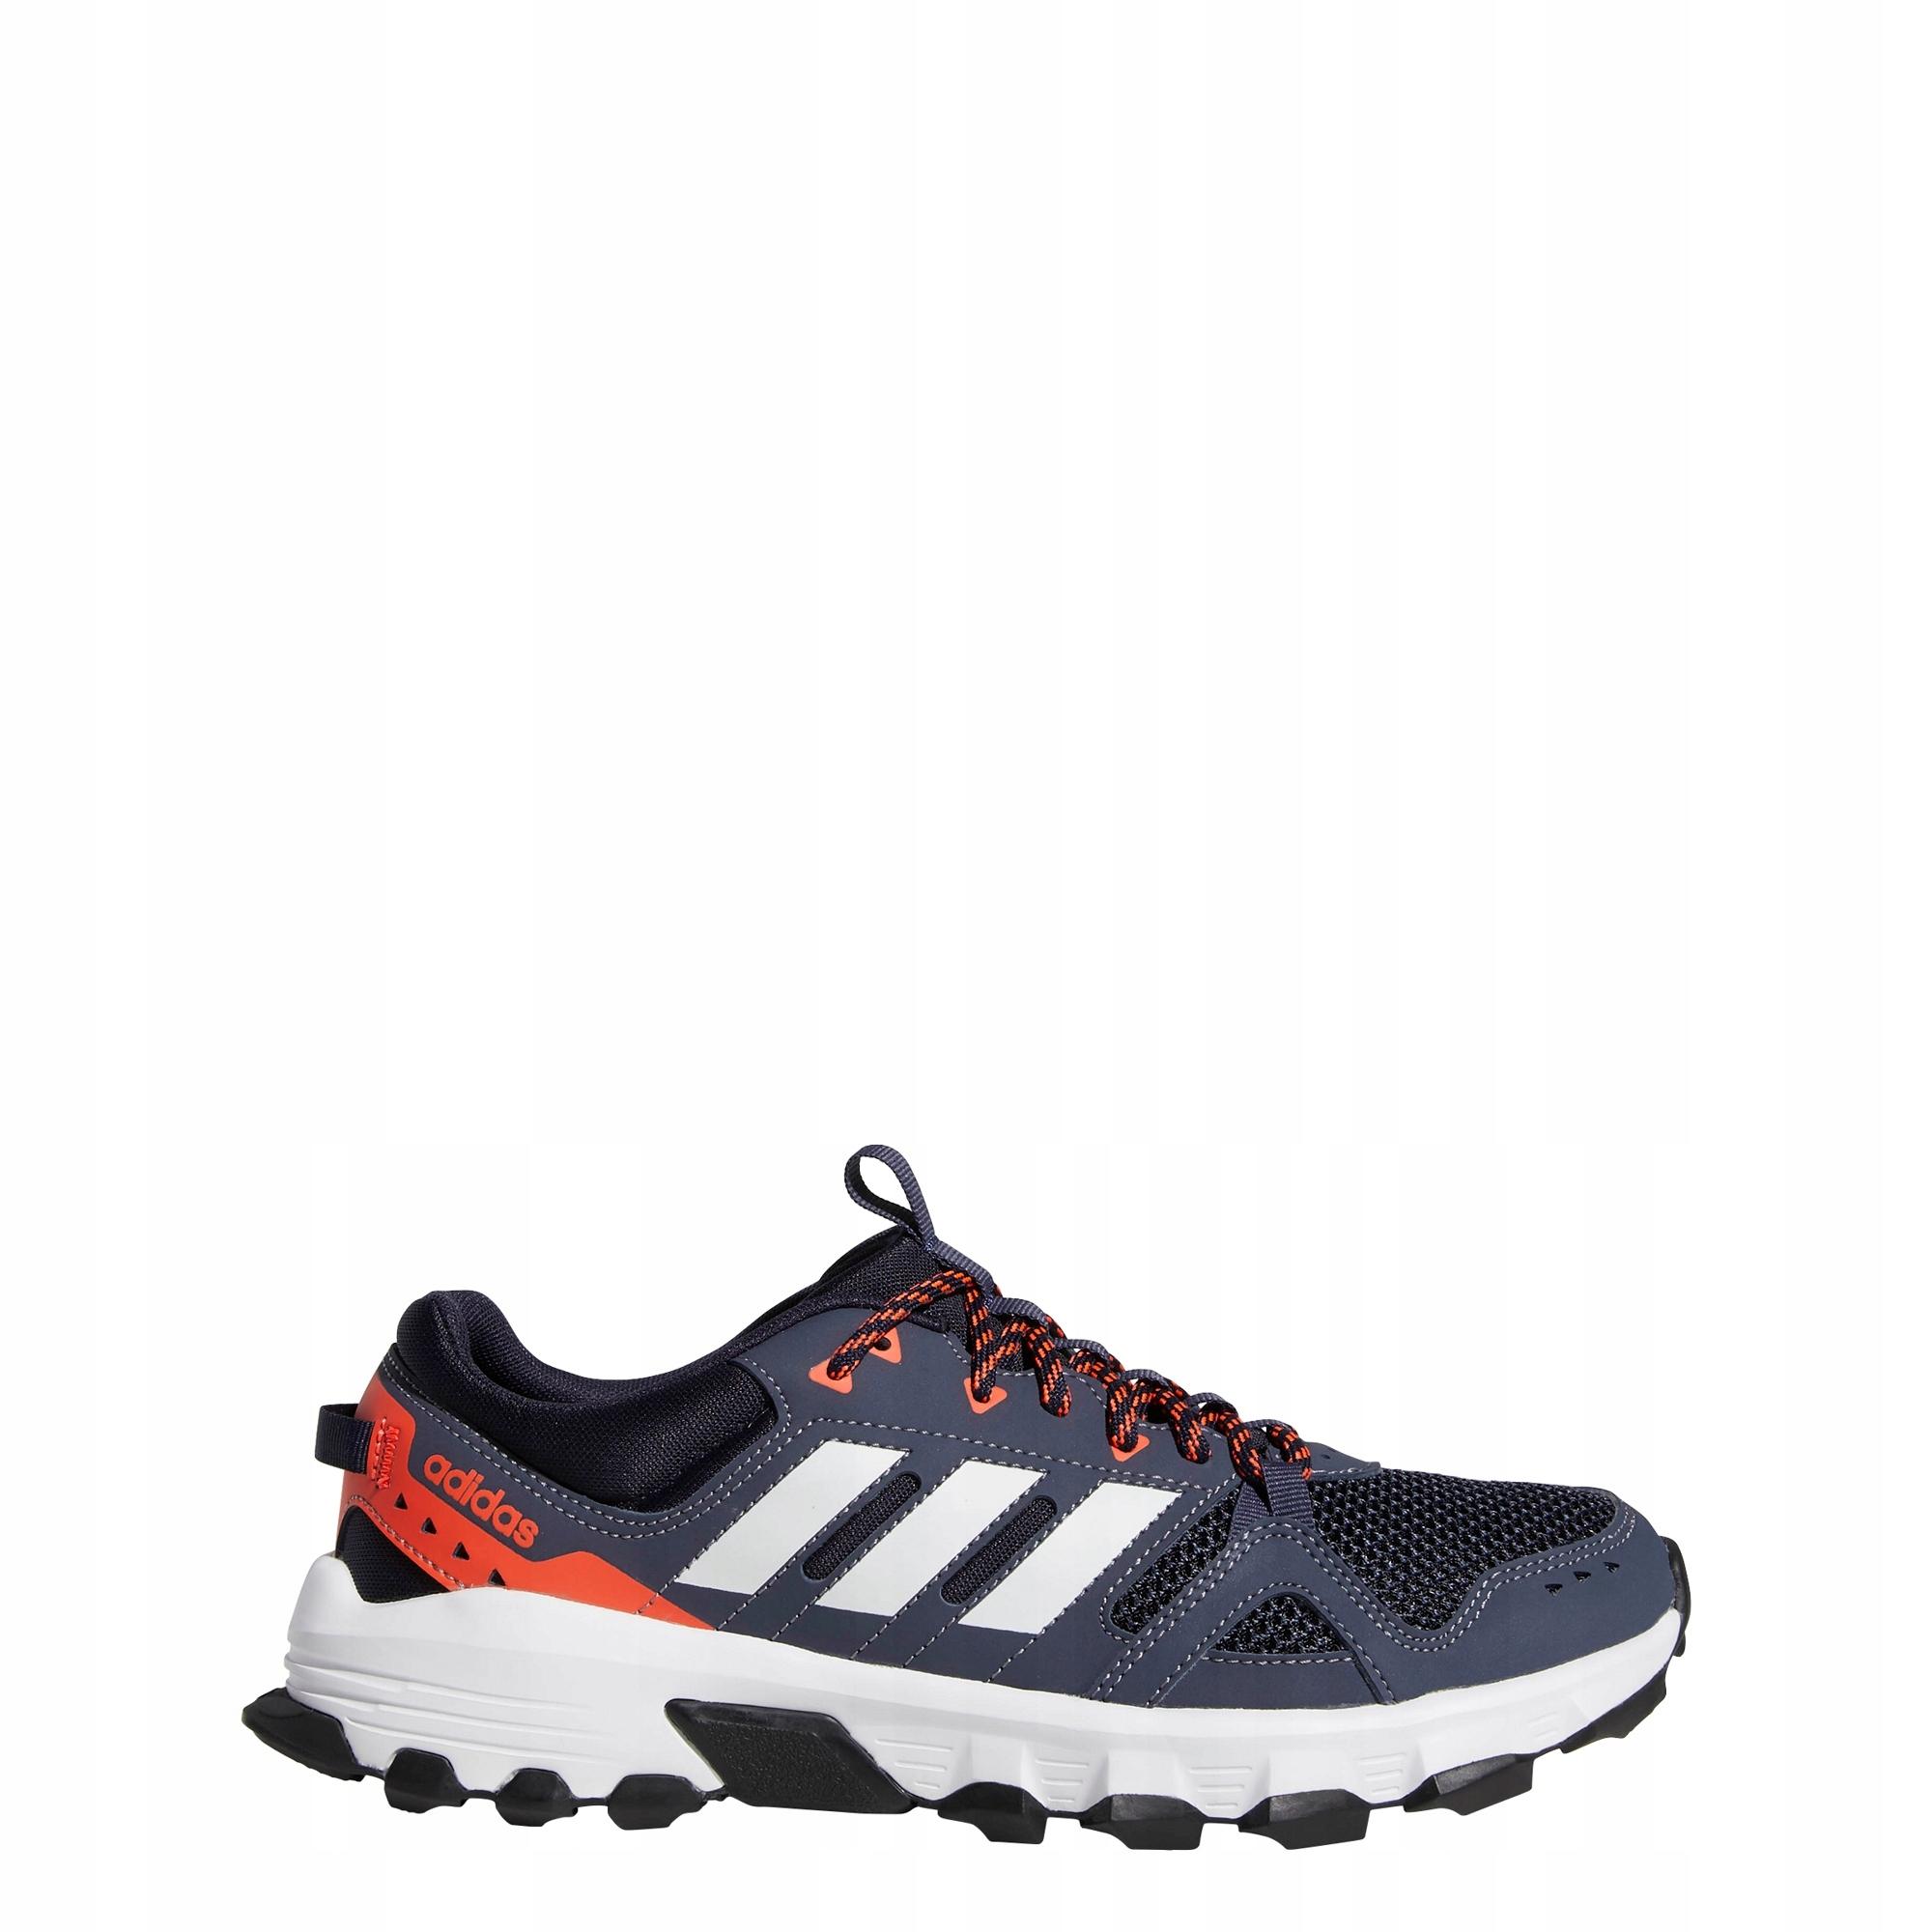 various colors e9d50 becca buty męskie adidas rockadia trail r 42 B43685 (7558237755)